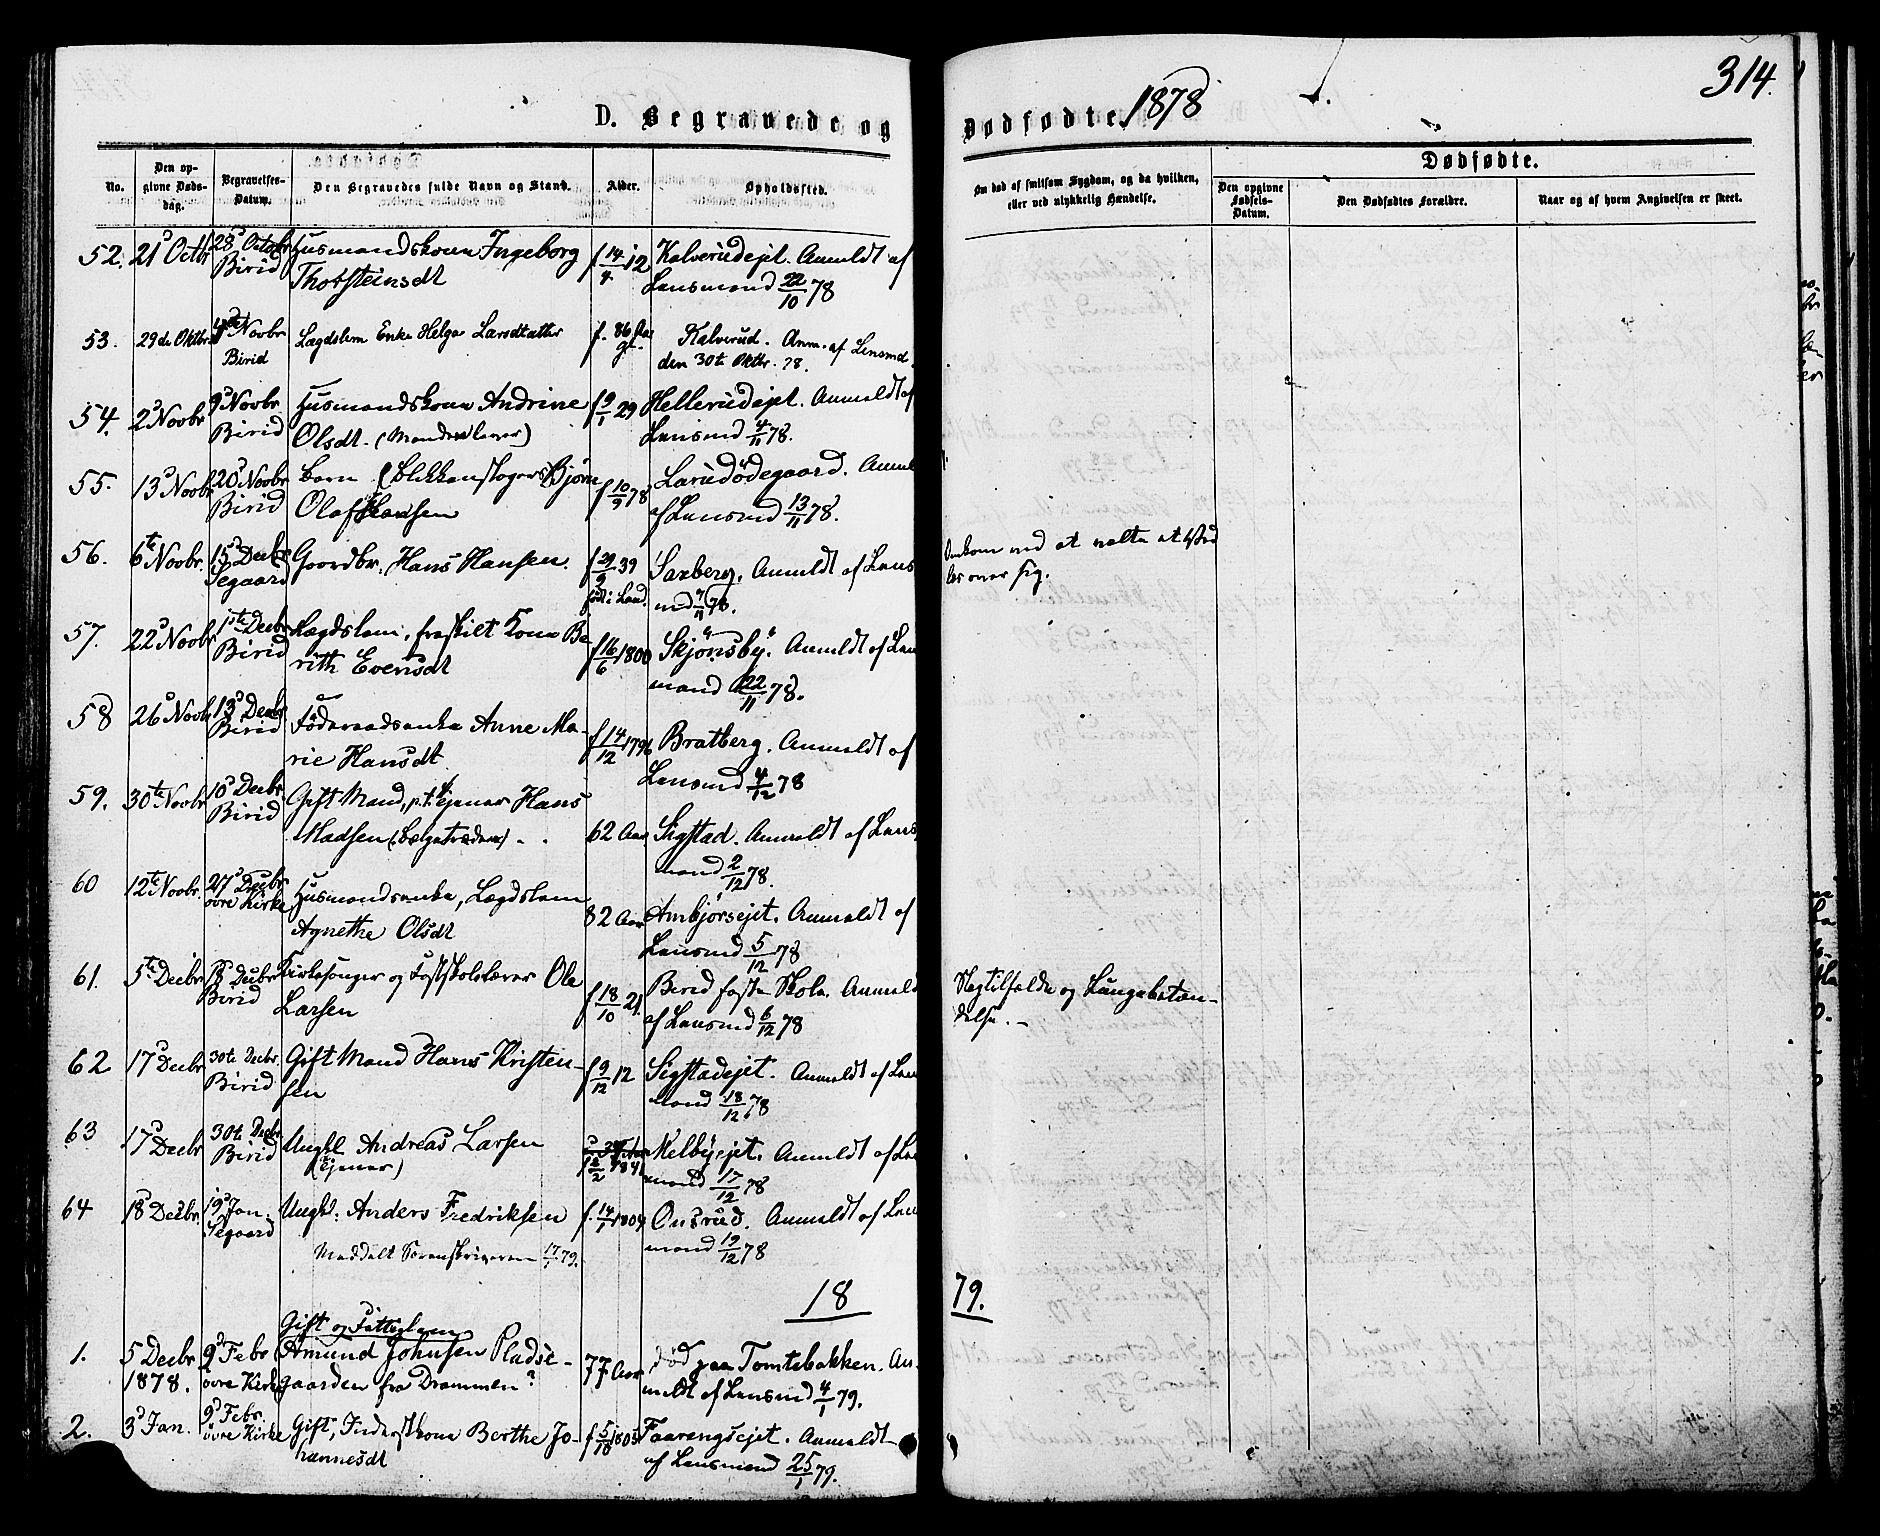 SAH, Biri prestekontor, Ministerialbok nr. 6, 1877-1886, s. 314